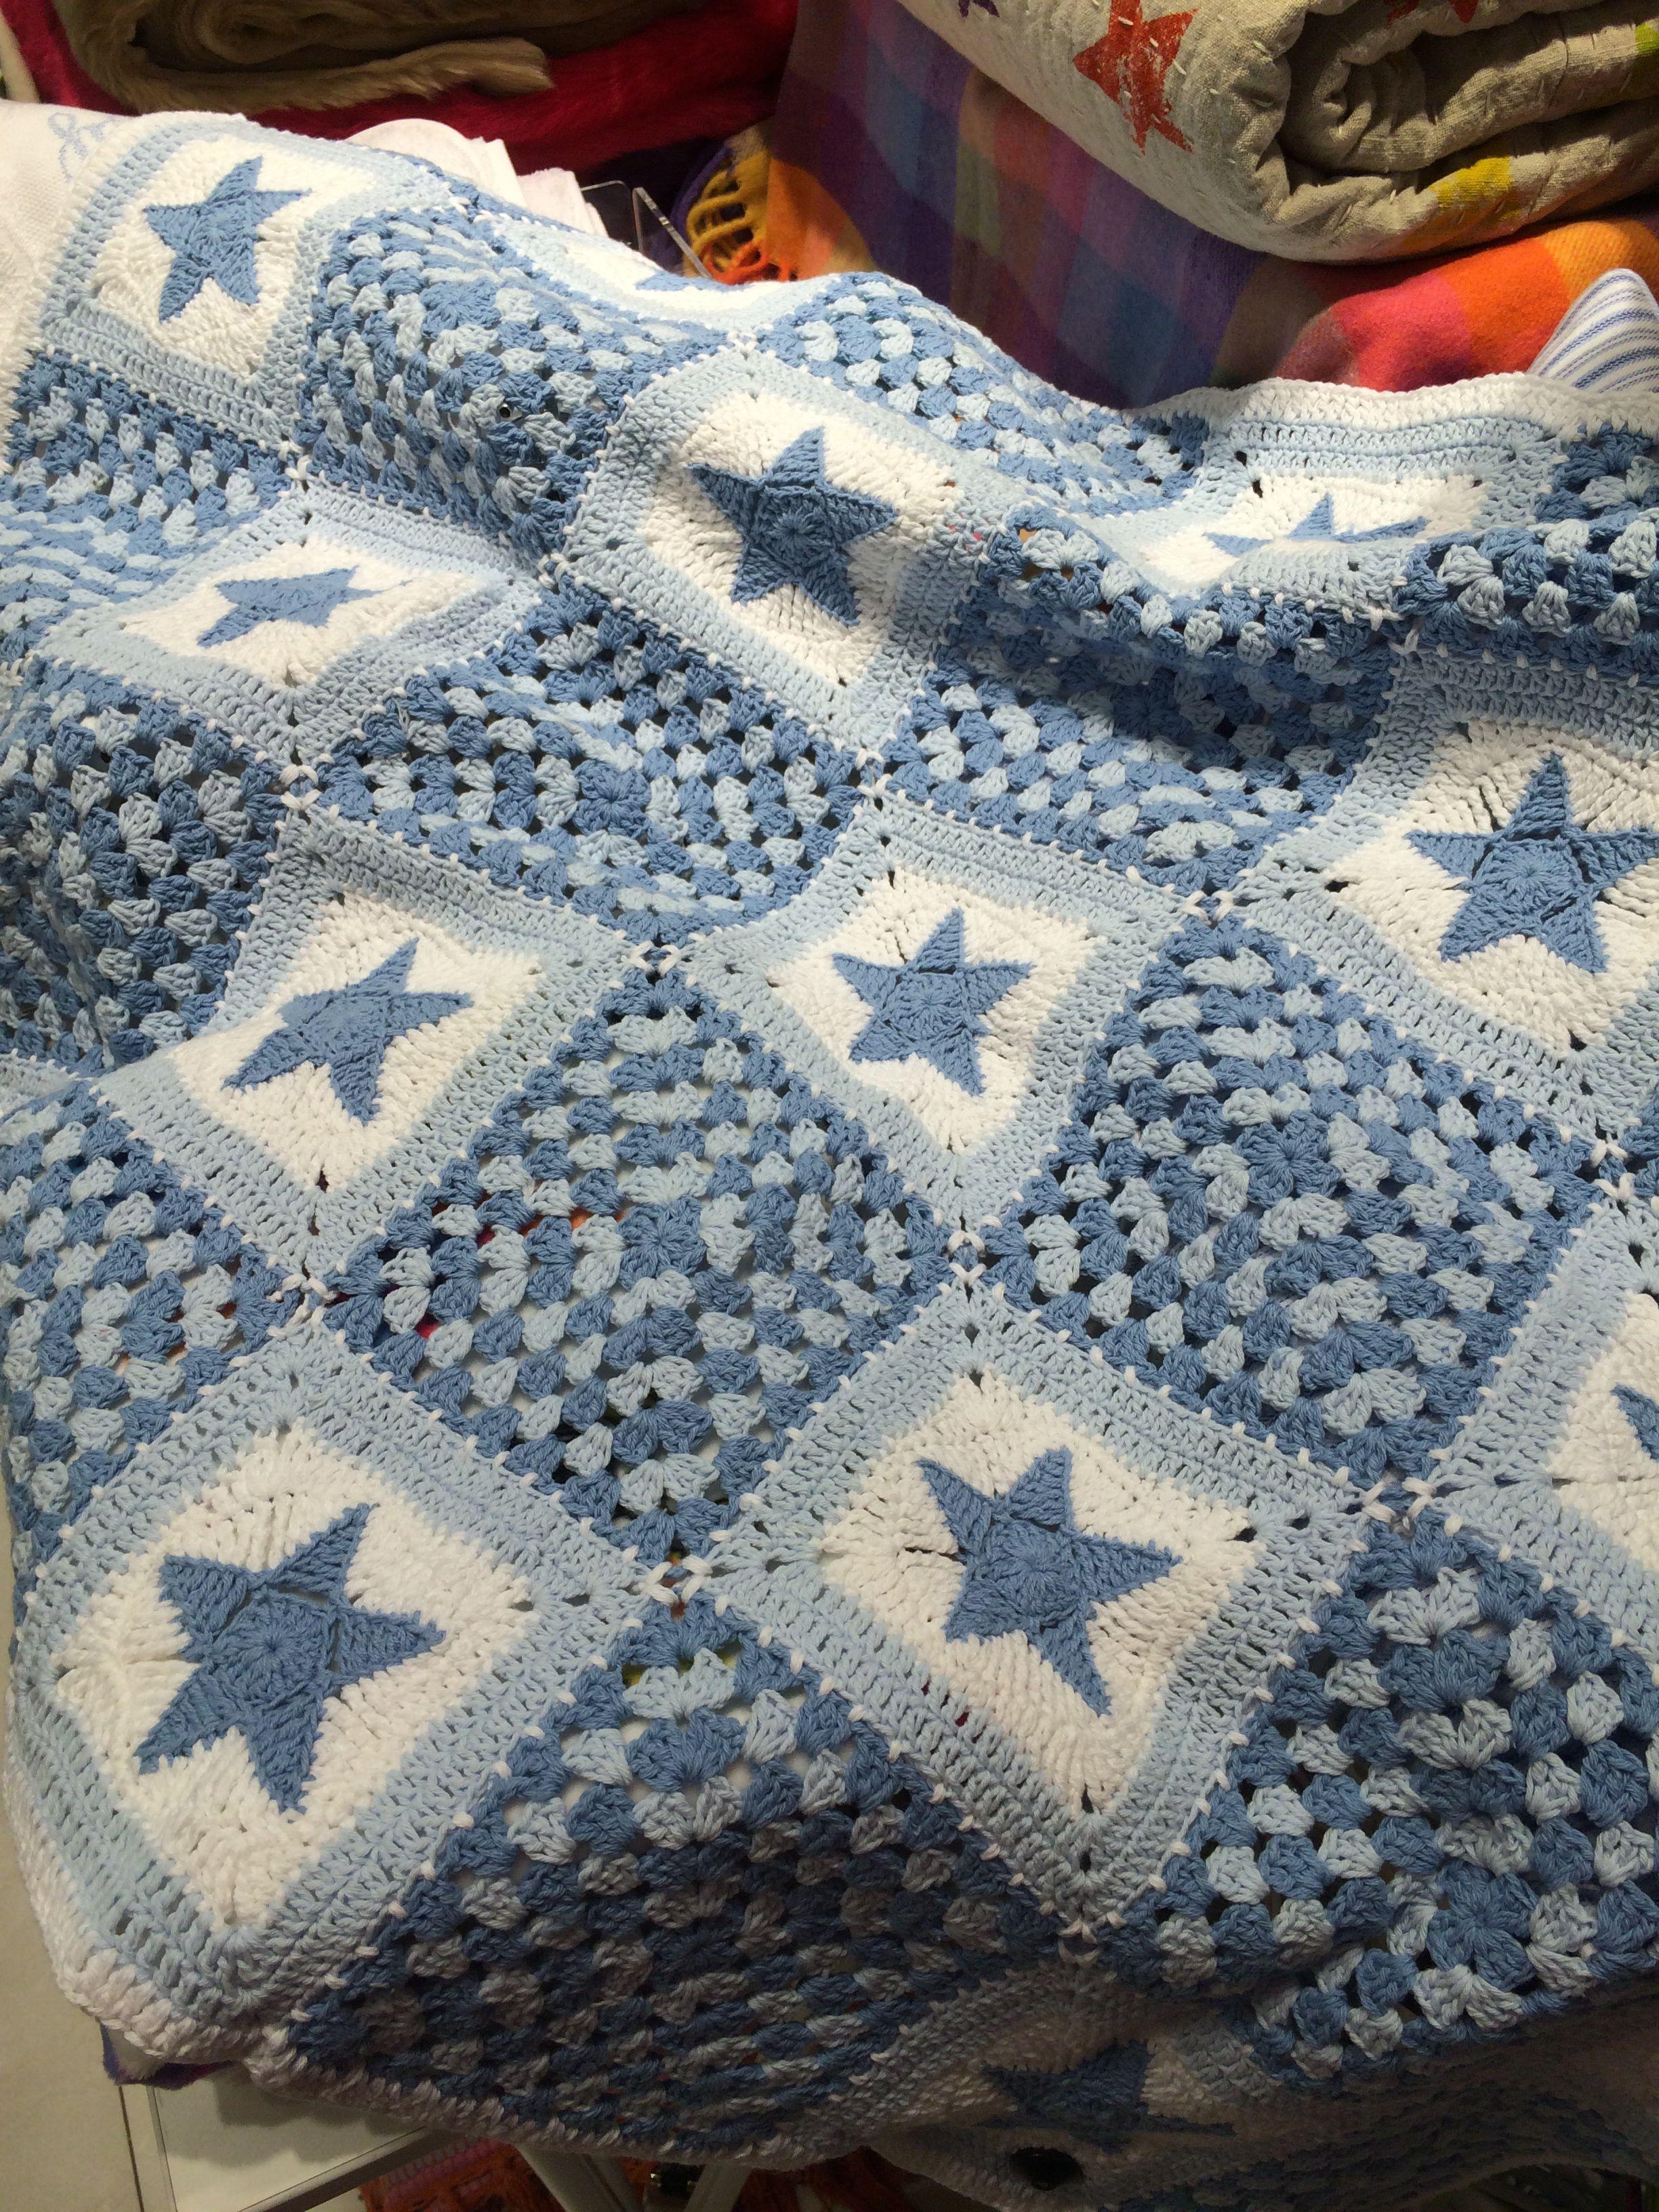 Zara Home Cojines Y Mantas.Love This Blanket Selling In Zara Home Gate Mall Kuwait